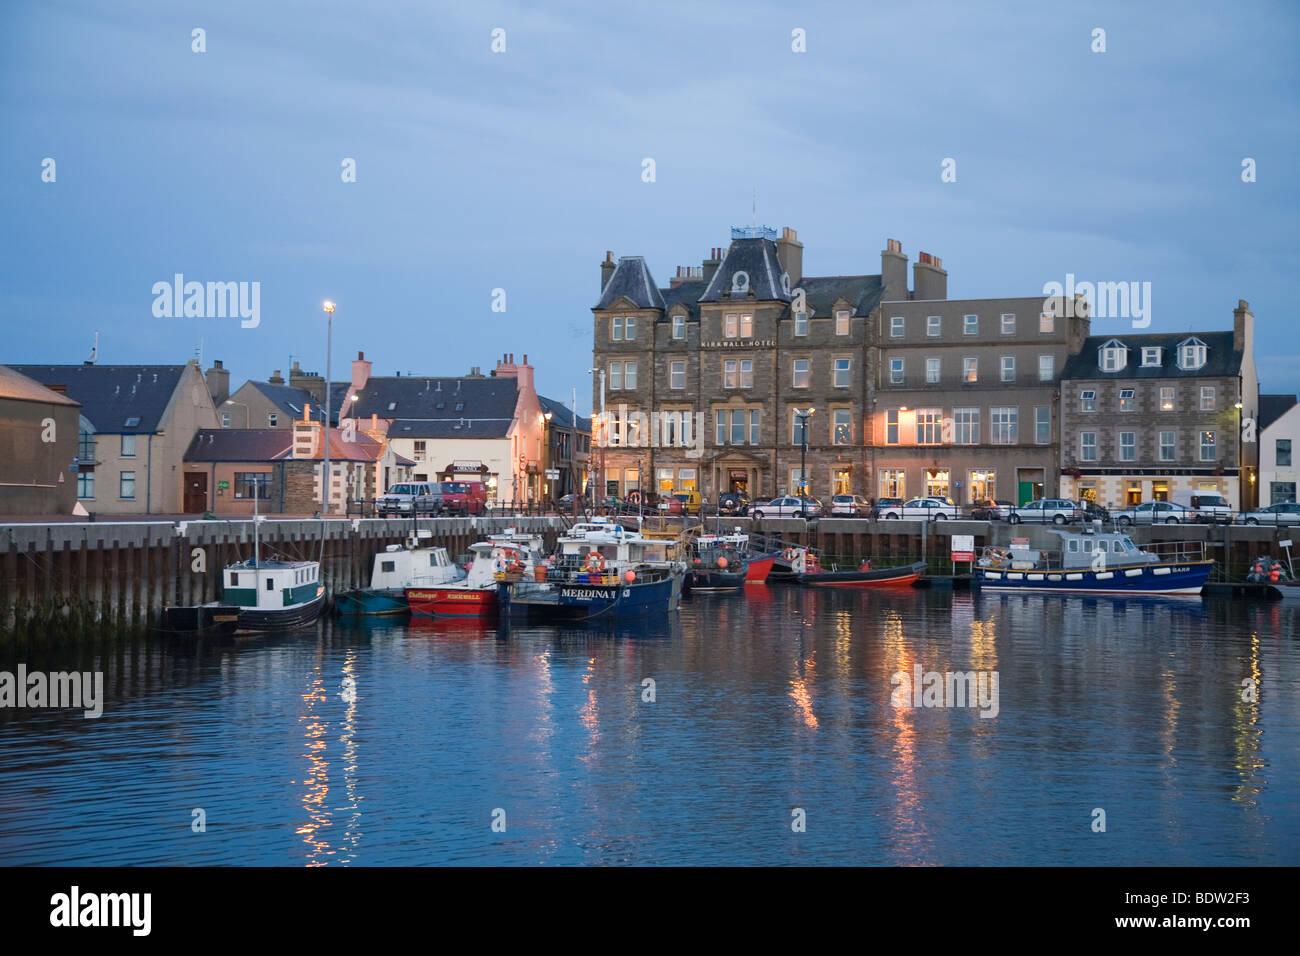 hafen von kirkwall, harbor of kirkwall, orkney islands, scotland - Stock Image